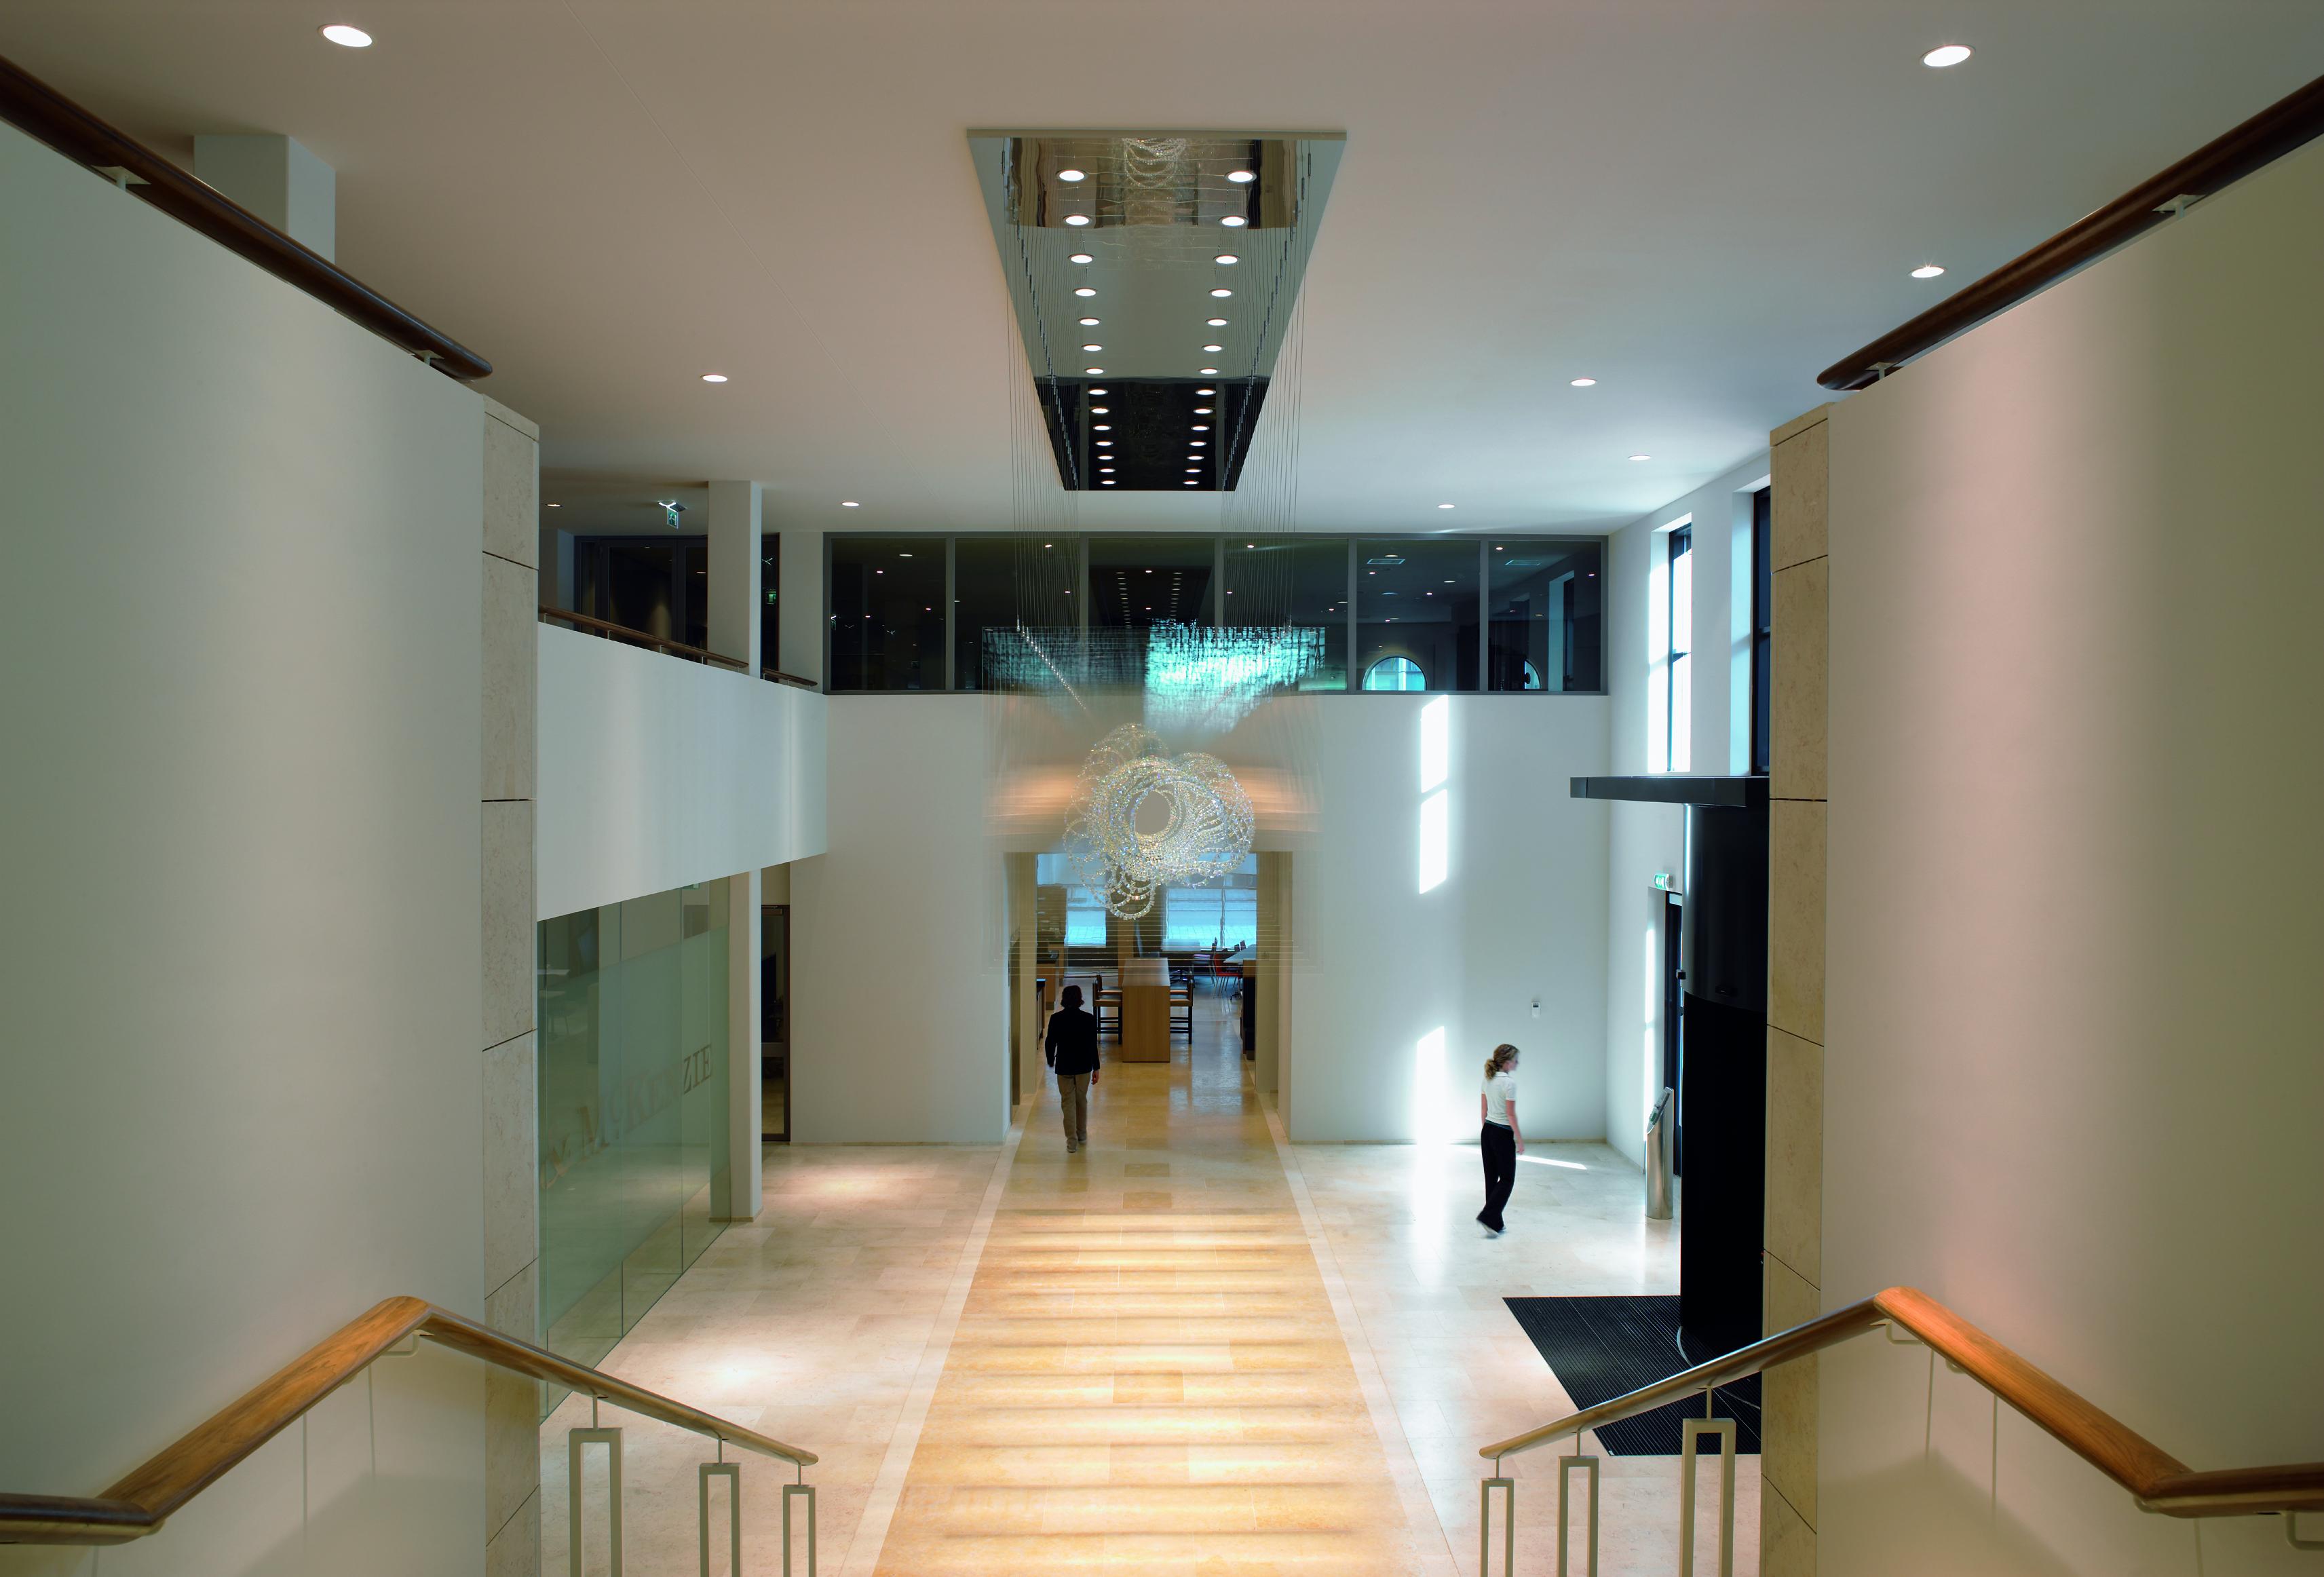 Lampe salon led - Iluminacion de interiores ...